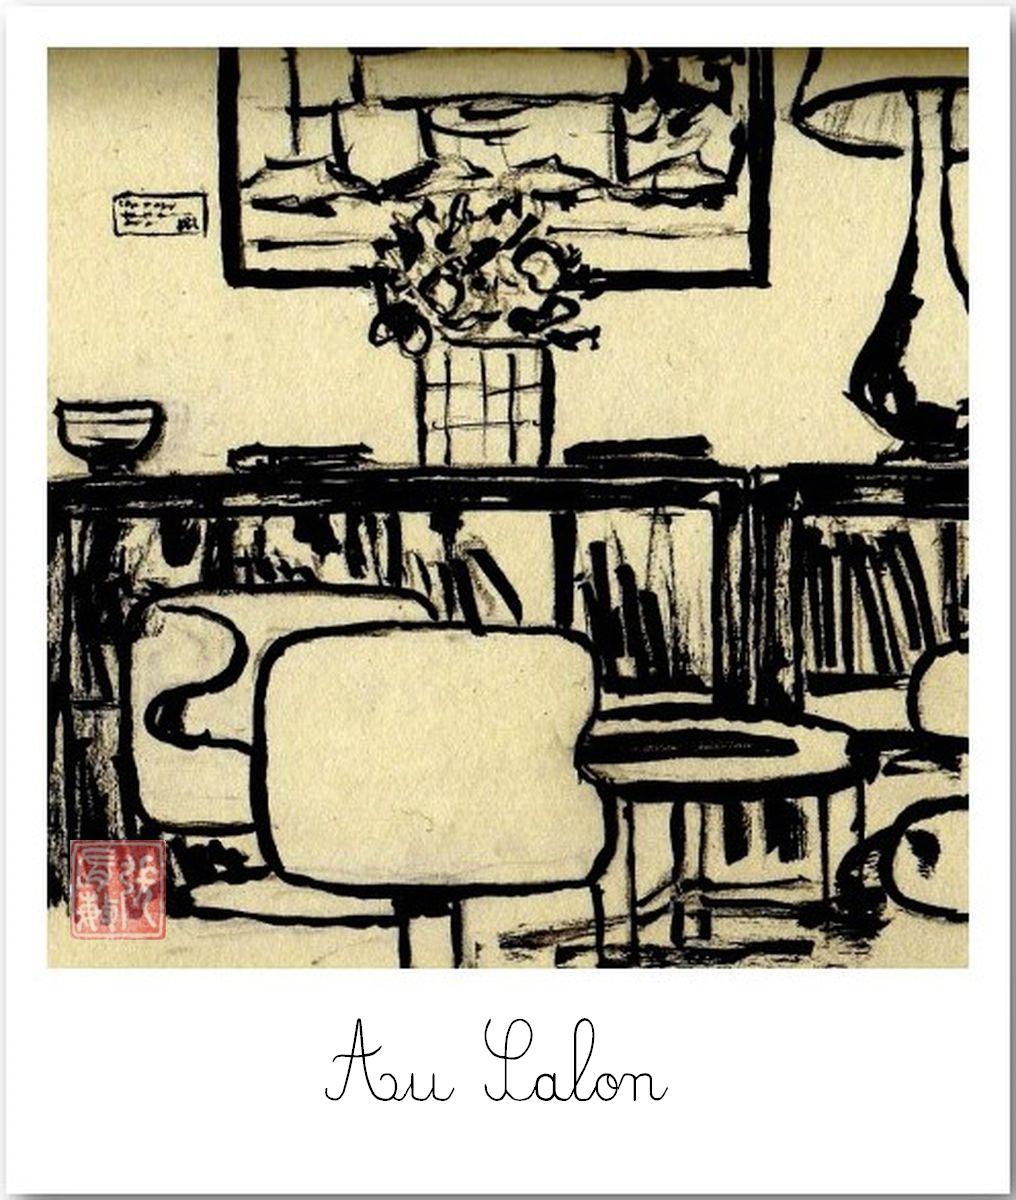 Restaurant Apportez Votre Vin Rue Fleury Montr Ef Bf Bdal